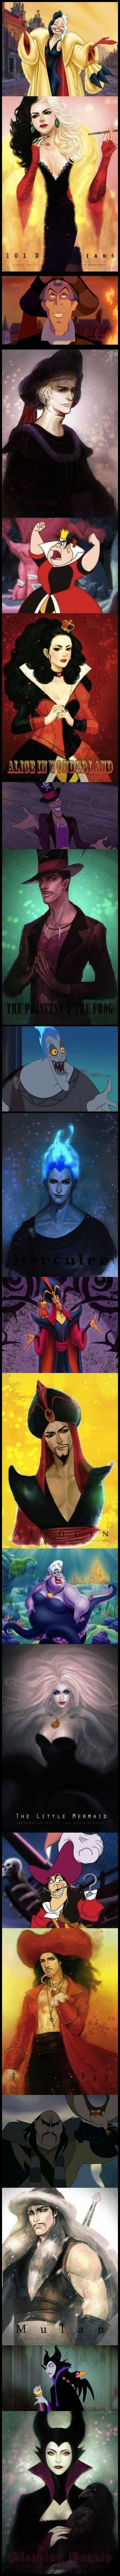 'What if Disney villains were beautiful?'